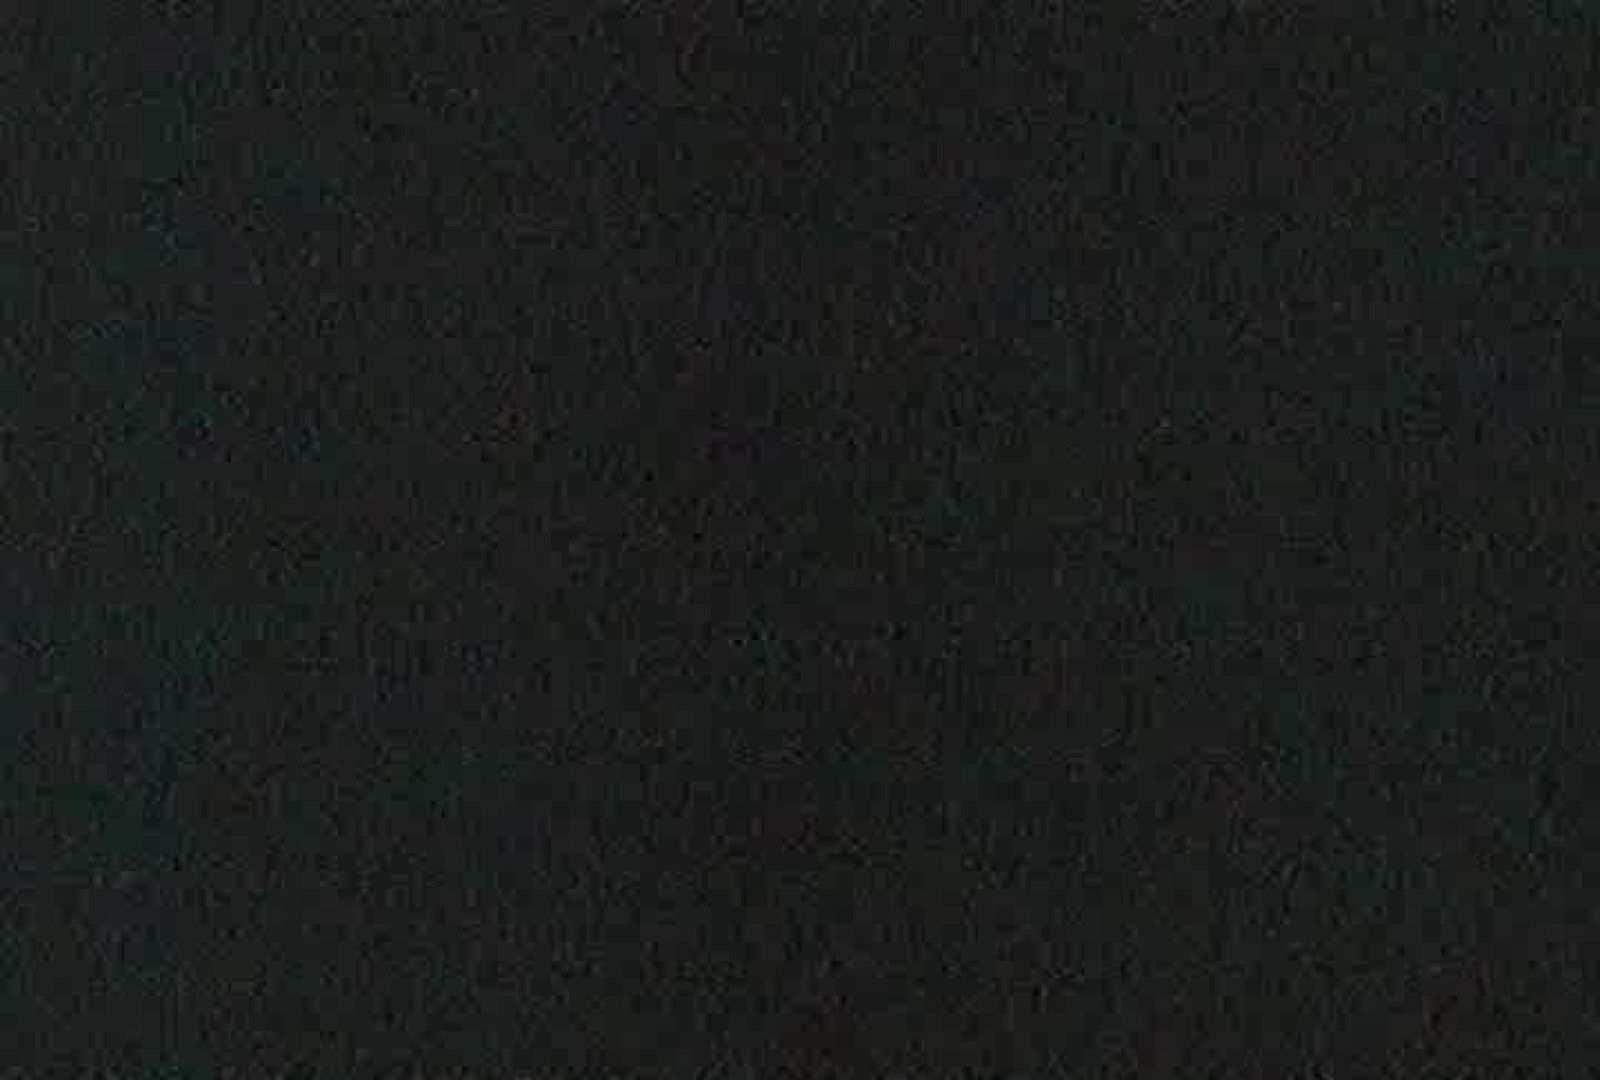 充血監督の深夜の運動会Vol.92 野外 性交動画流出 97pic 31